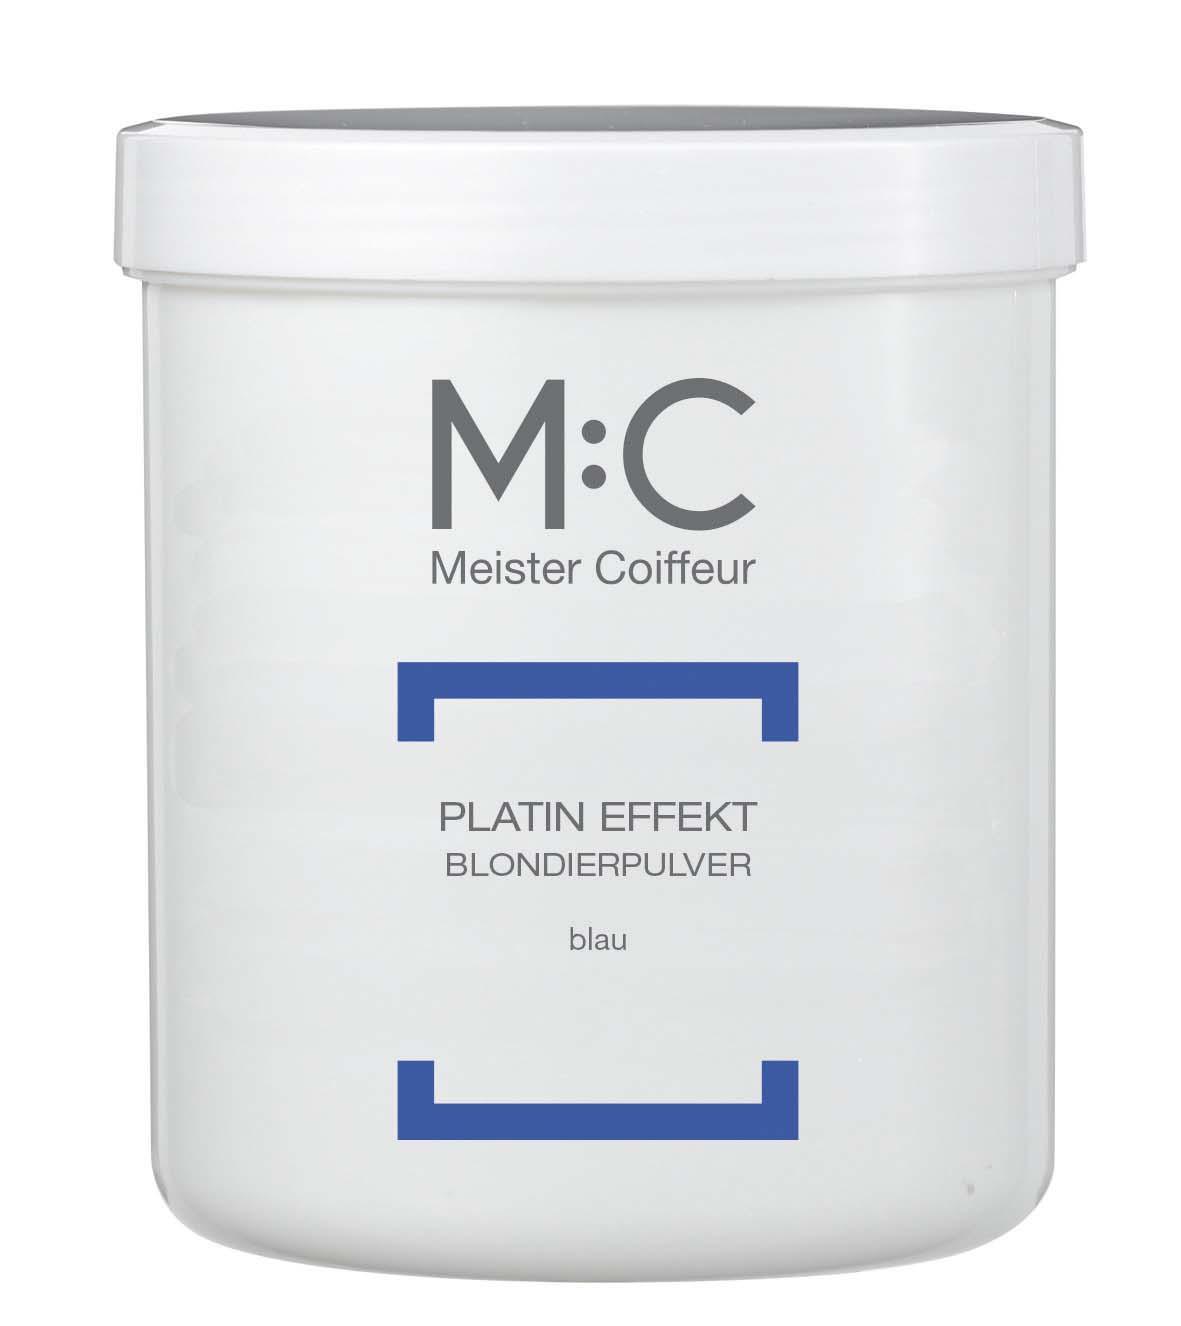 M:C Platin Effect C 100 g